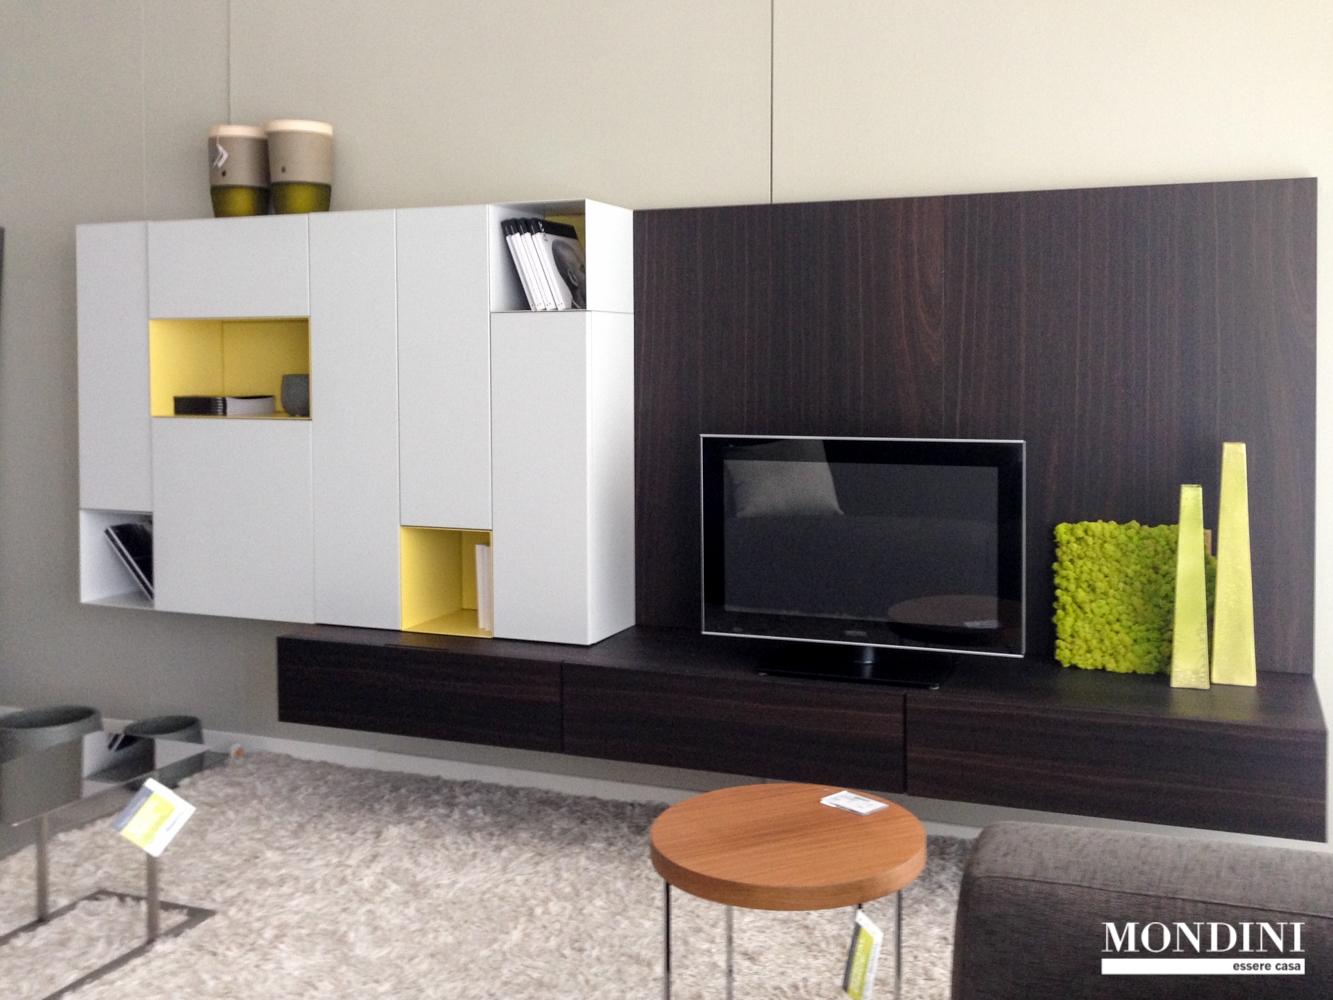 Best Soggiorni Poliform Gallery - Idee Arredamento Casa & Interior ...